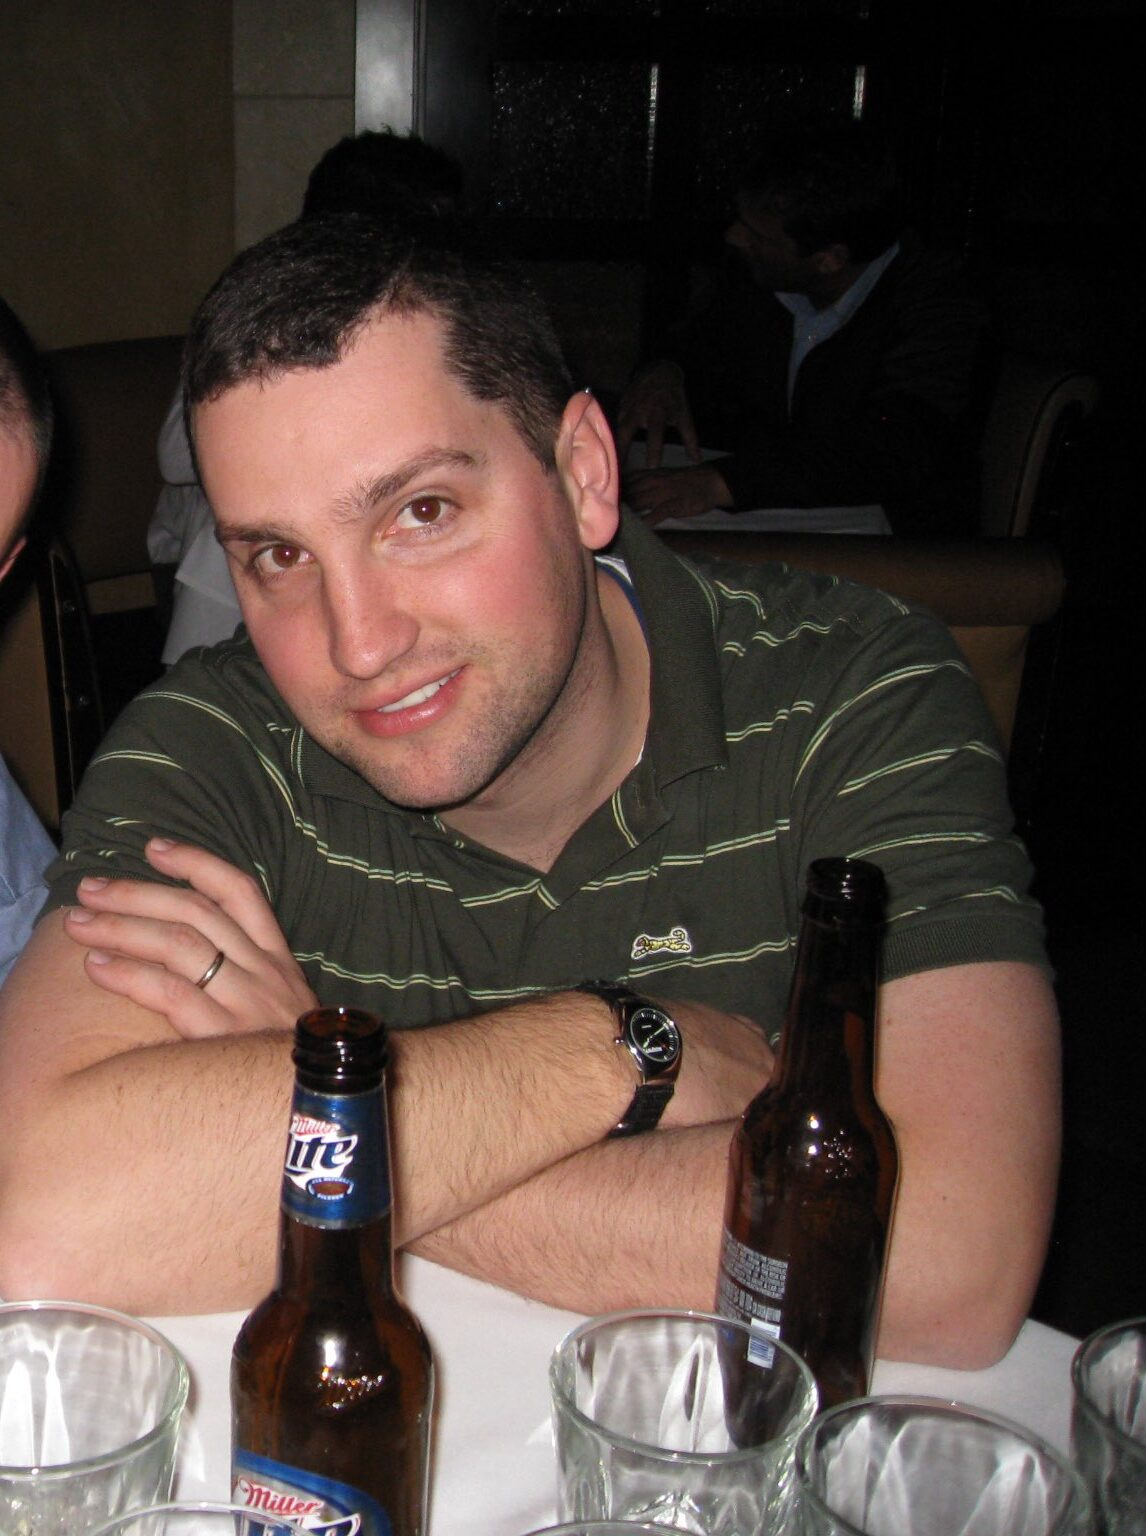 Jim Murphy WBZ-TV Editor Obituary, wiki